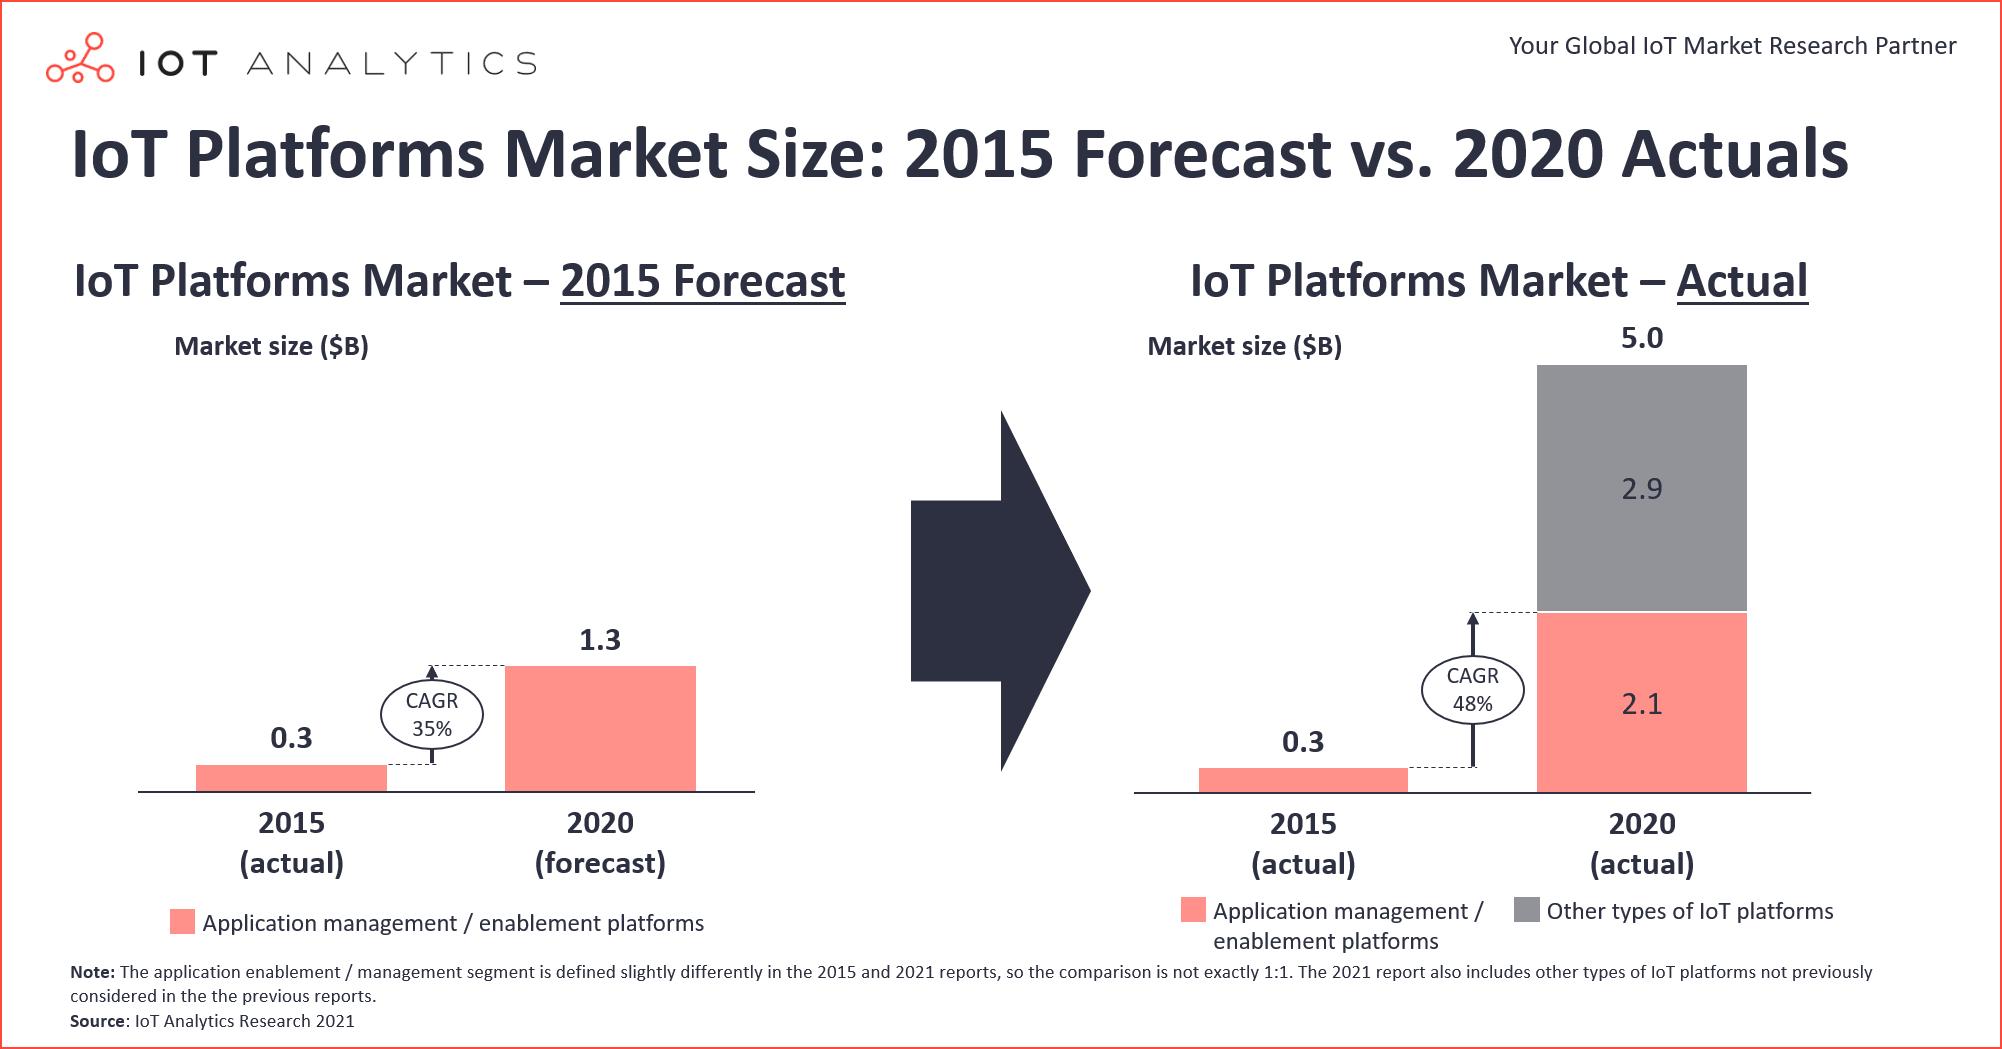 IoT Platforms Market Size - 2015 Forecast vs 2020 Actuals